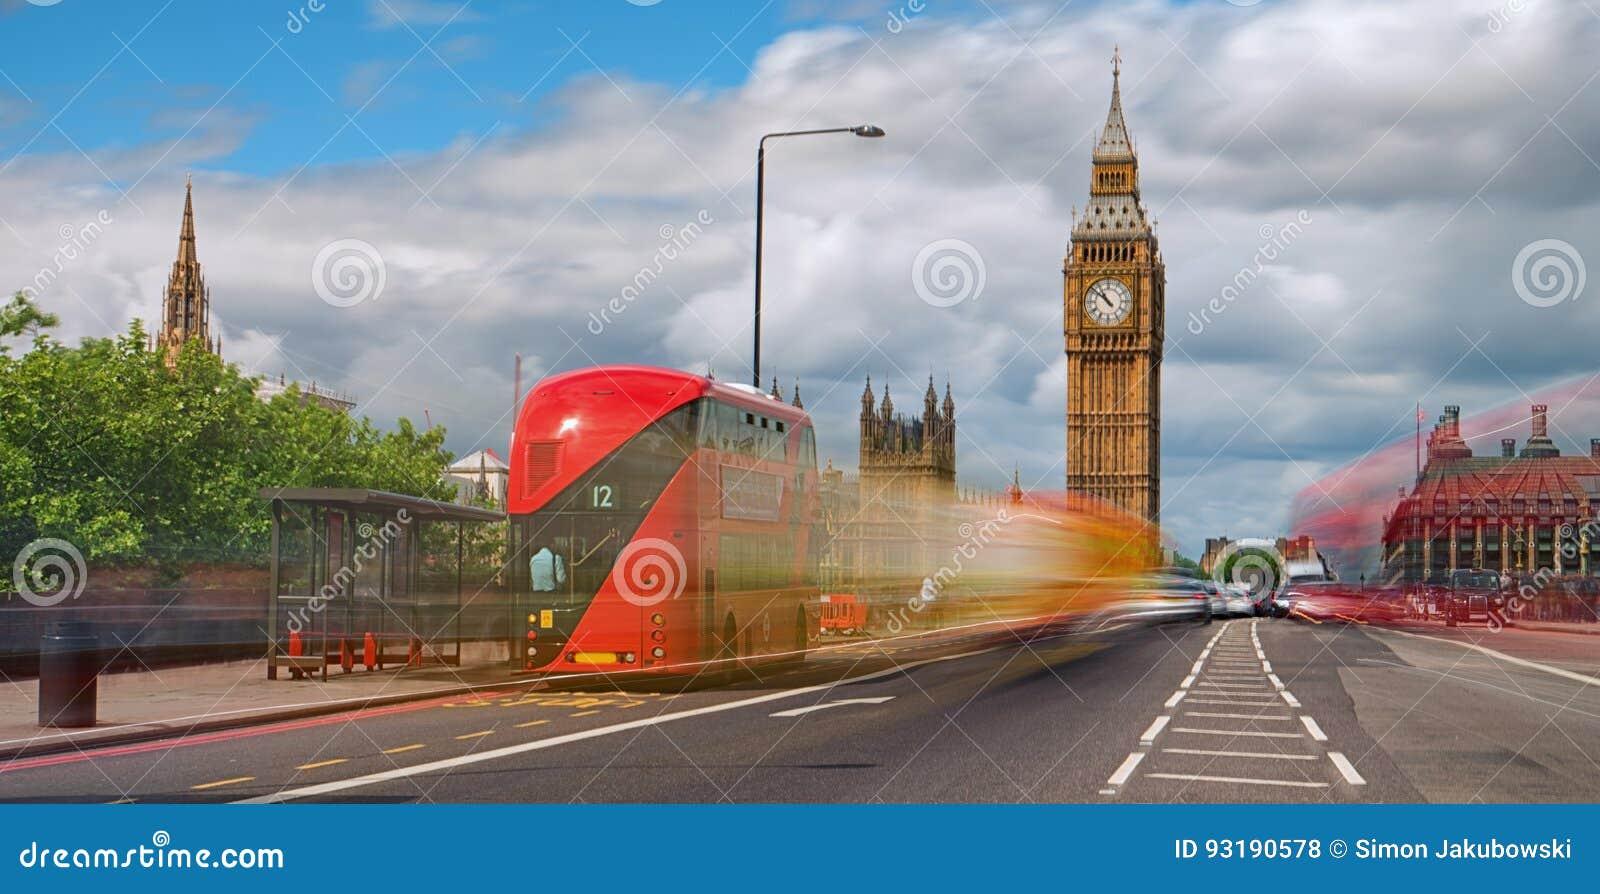 Red bus in front of Big Ben